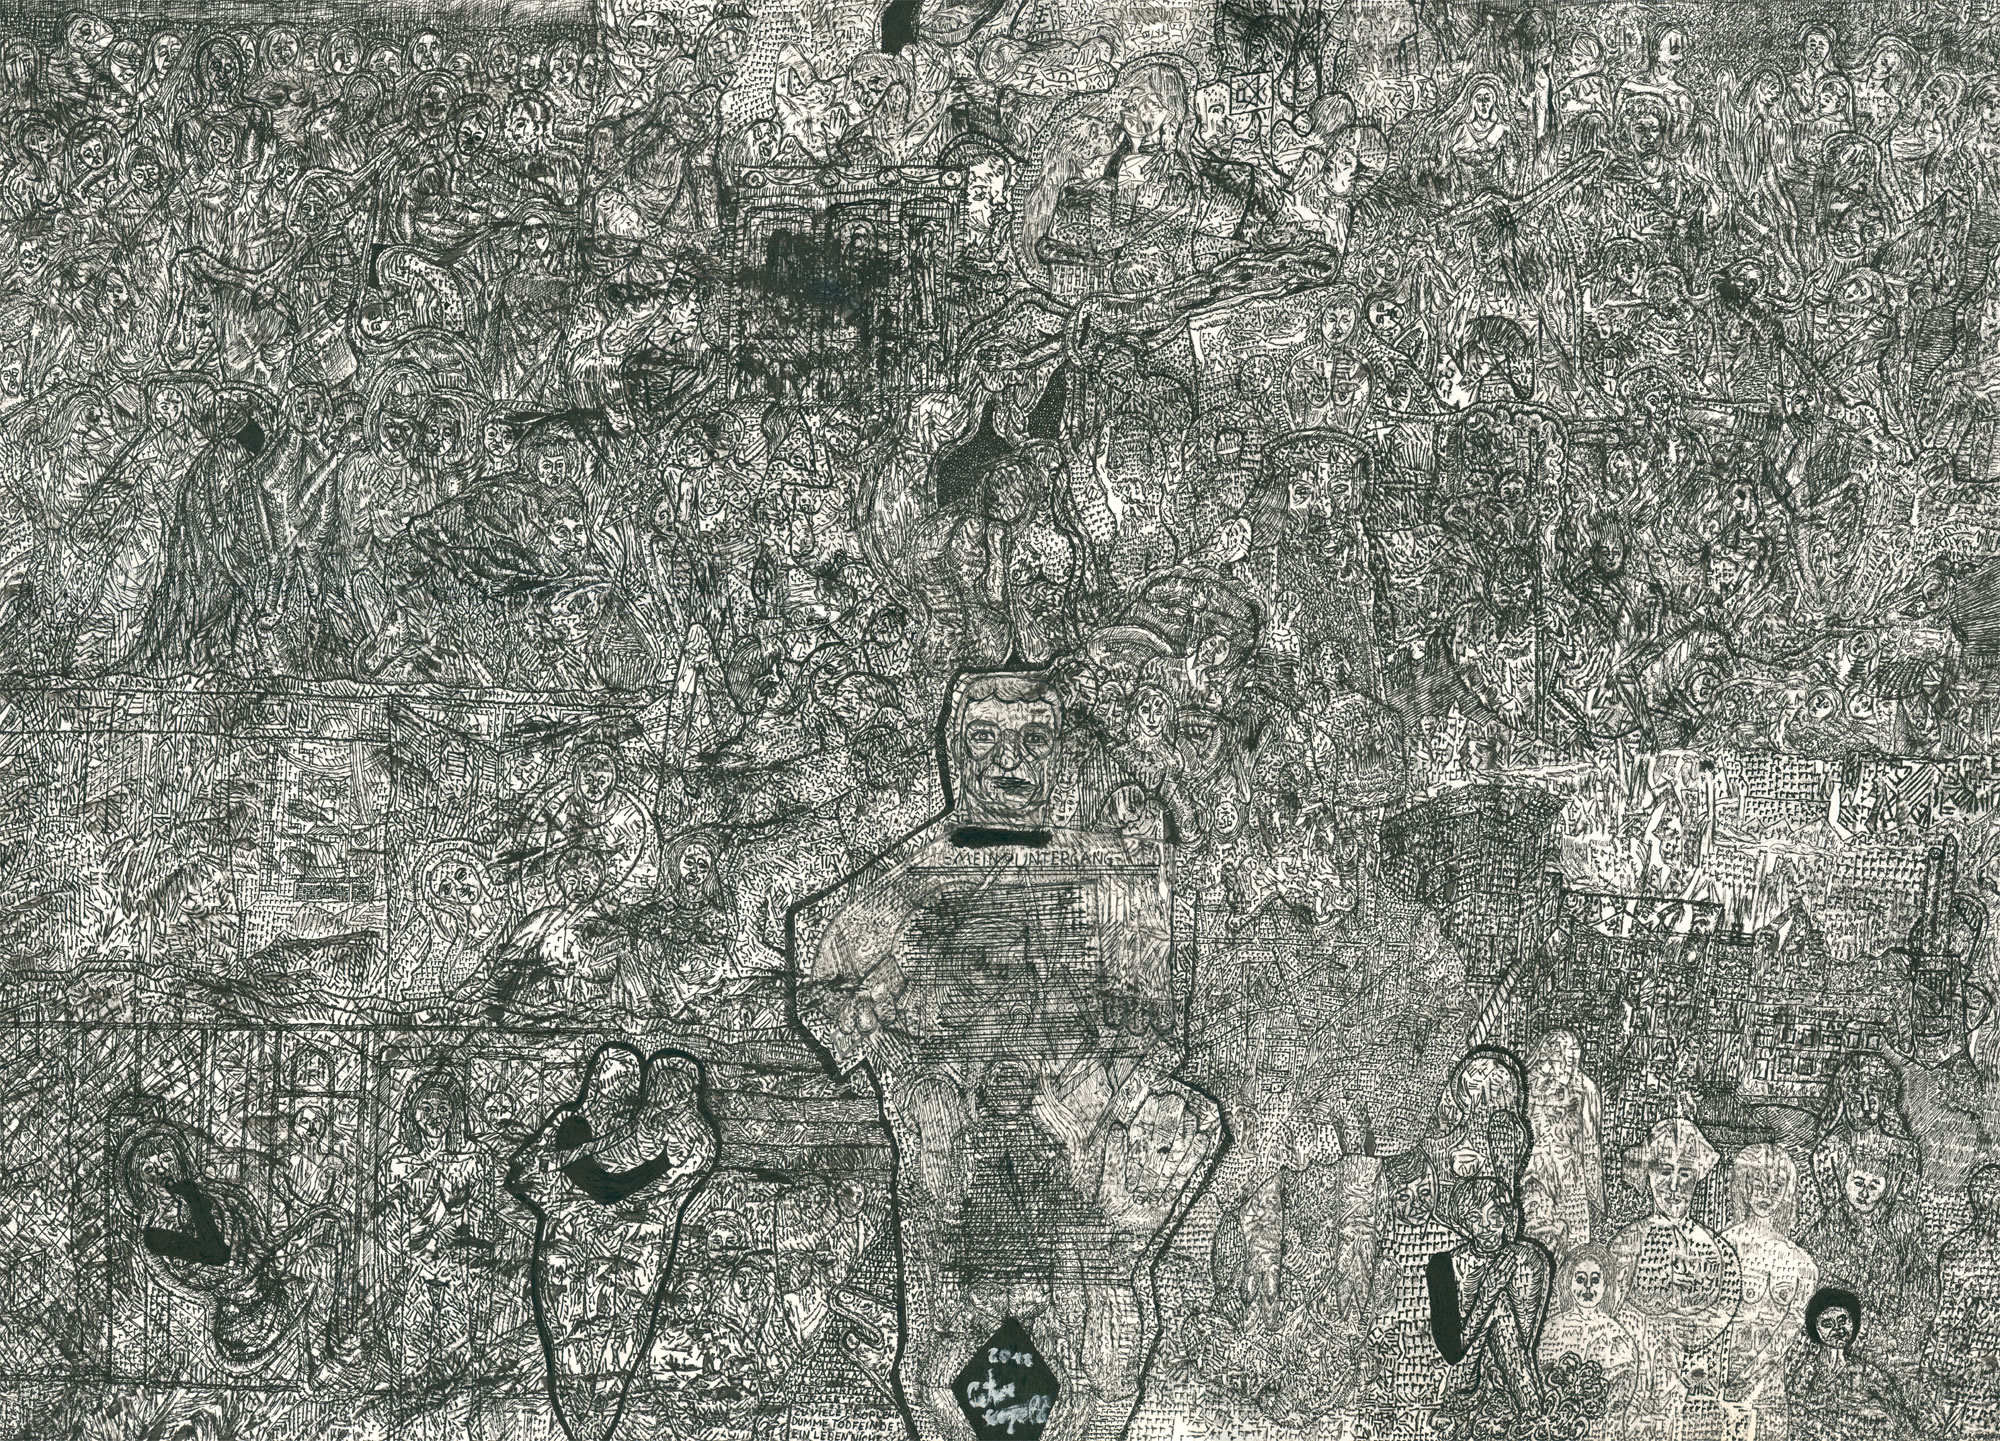 Peter Kapeller | 2018 | unheimlich heimelig | Galerie3